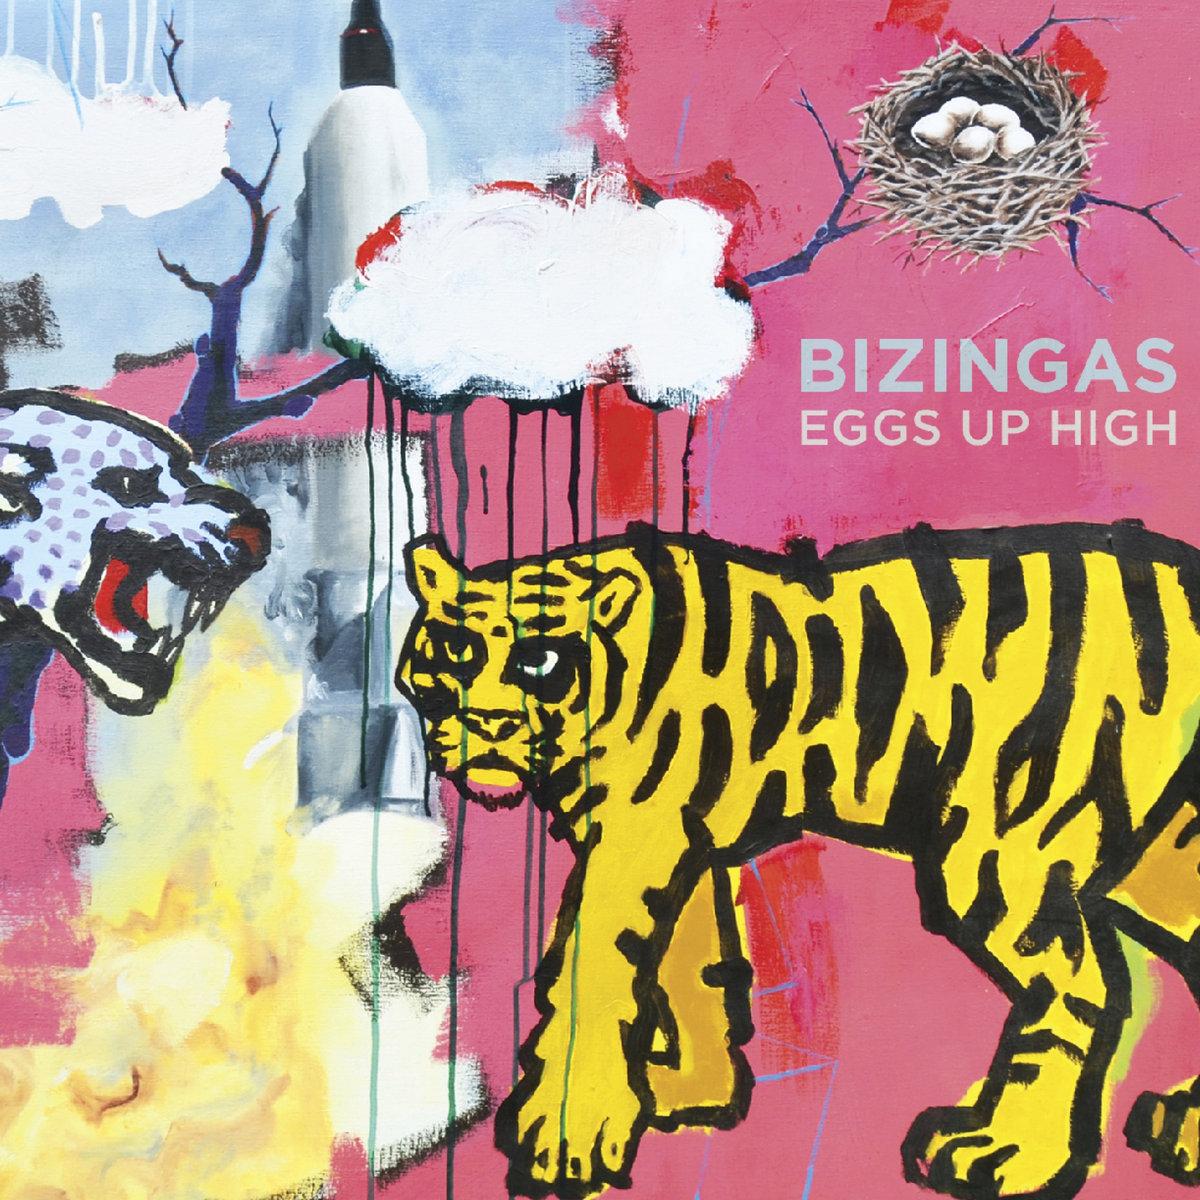 Album Review: Brian Drye's Bizingas – Eggs Up High (2015)